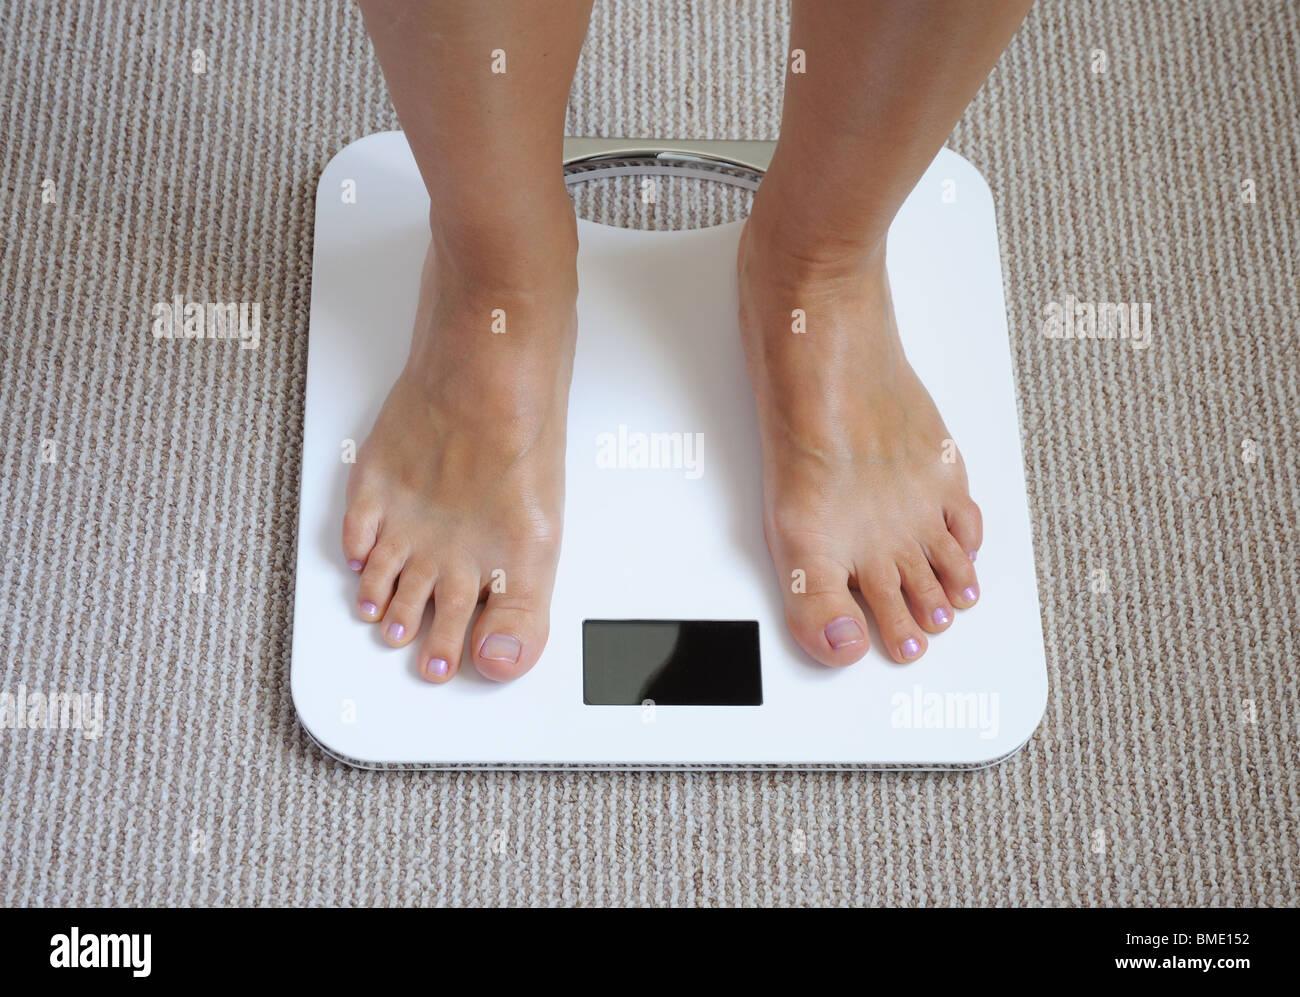 Female feet on bathroom scale - Stock Image